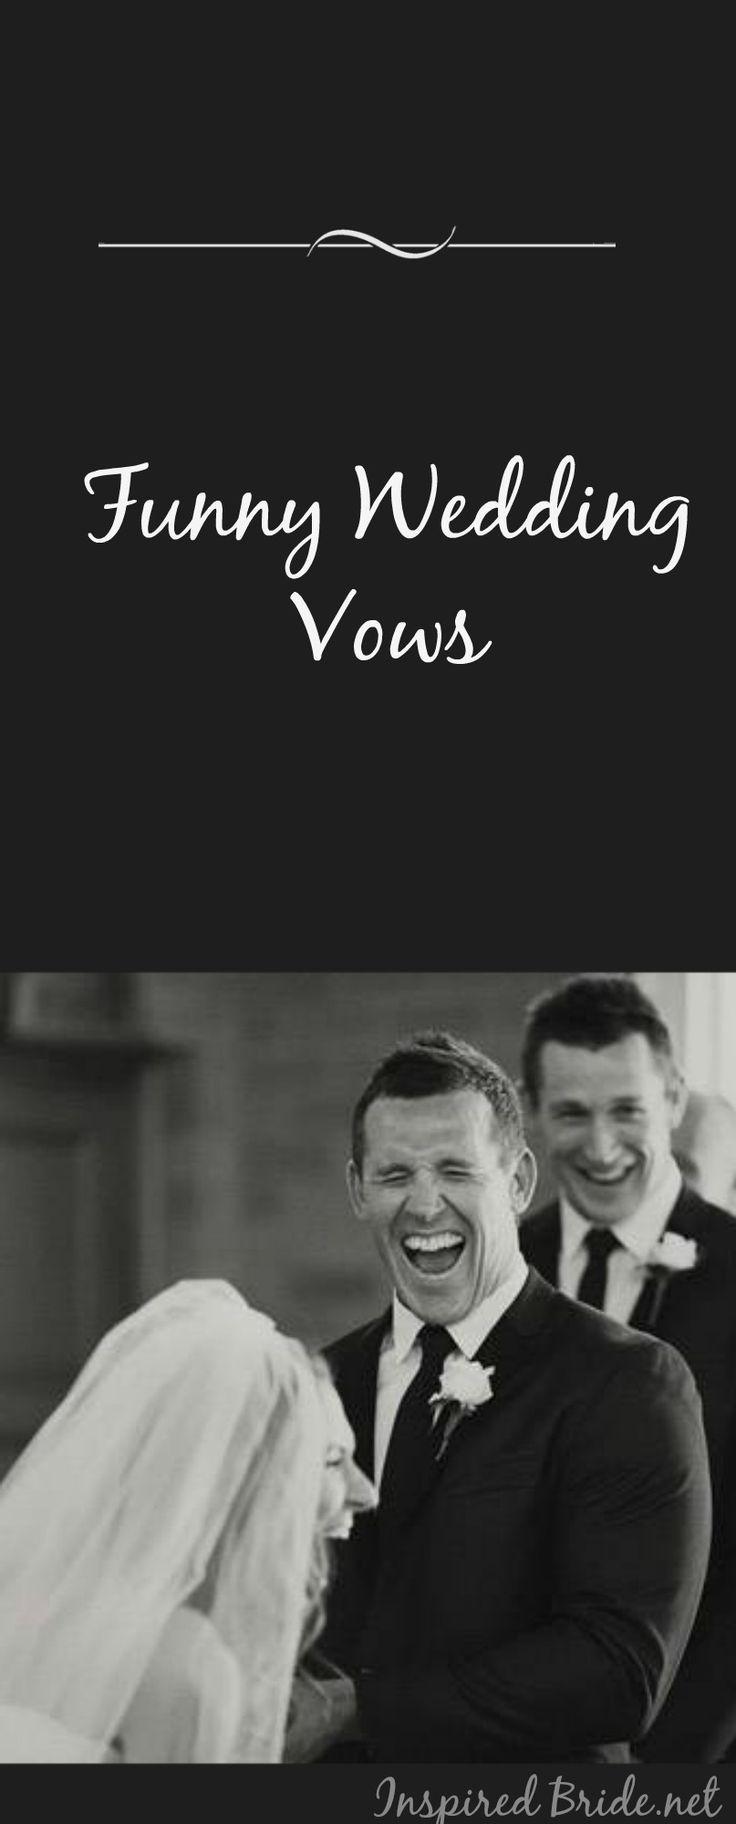 Funny wedding vows the inspired bride wedding ceremony